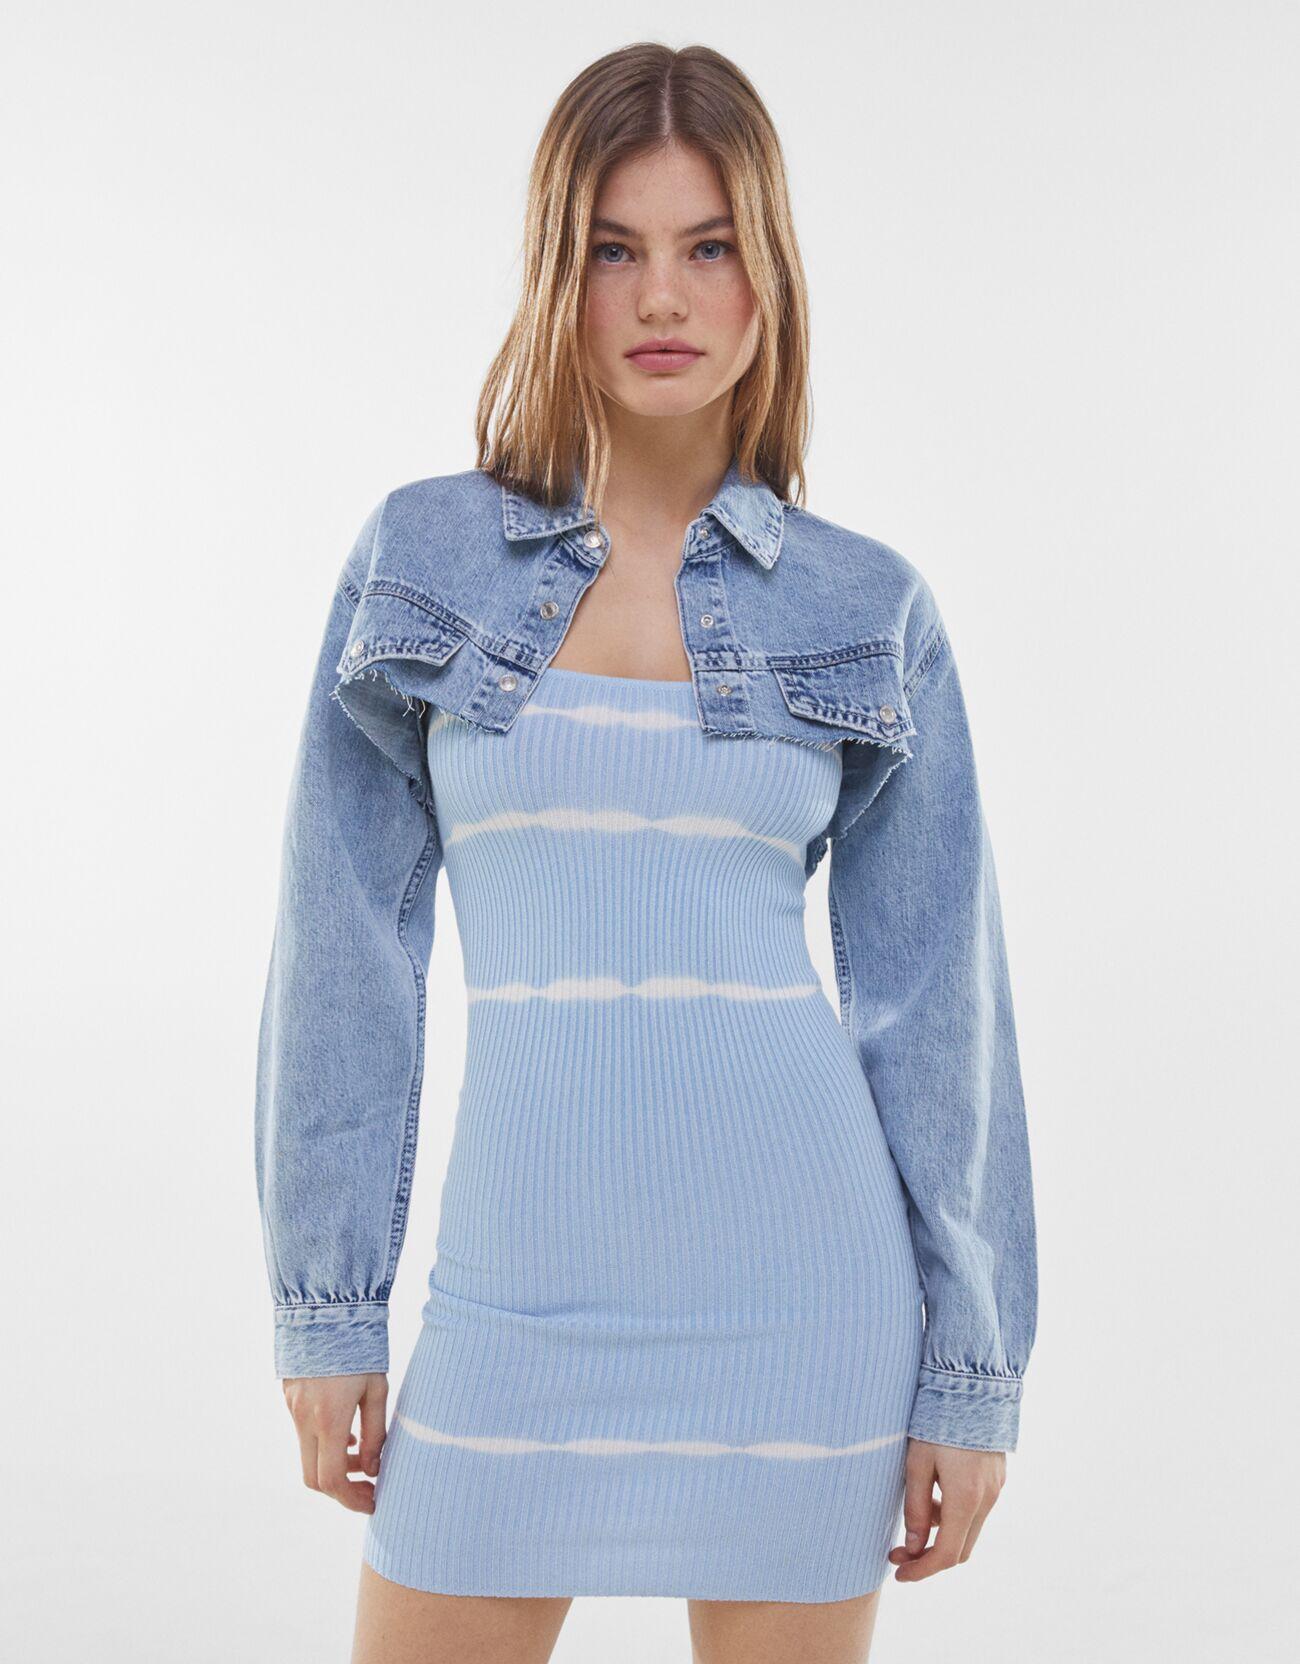 bershka -  Cropped-Jeanshemd Damen M Ausgewaschenes Blau